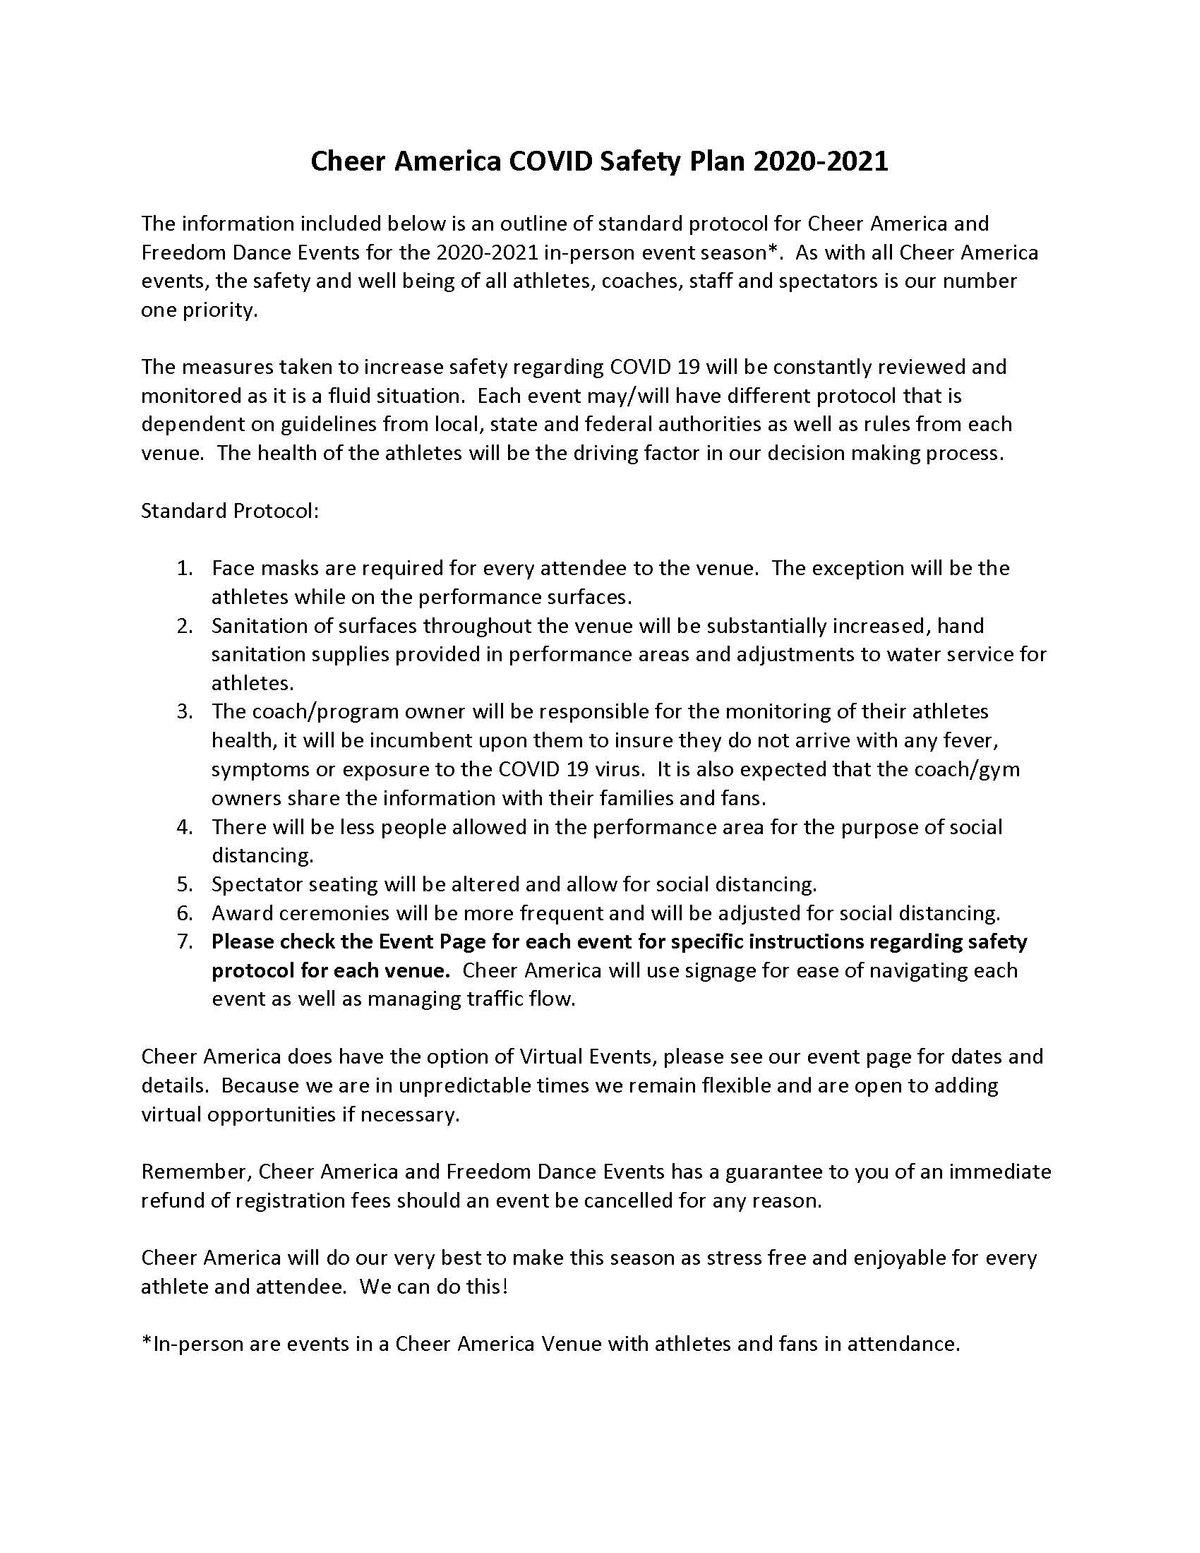 Cheer America COVID Safety Plan 2020.jpg